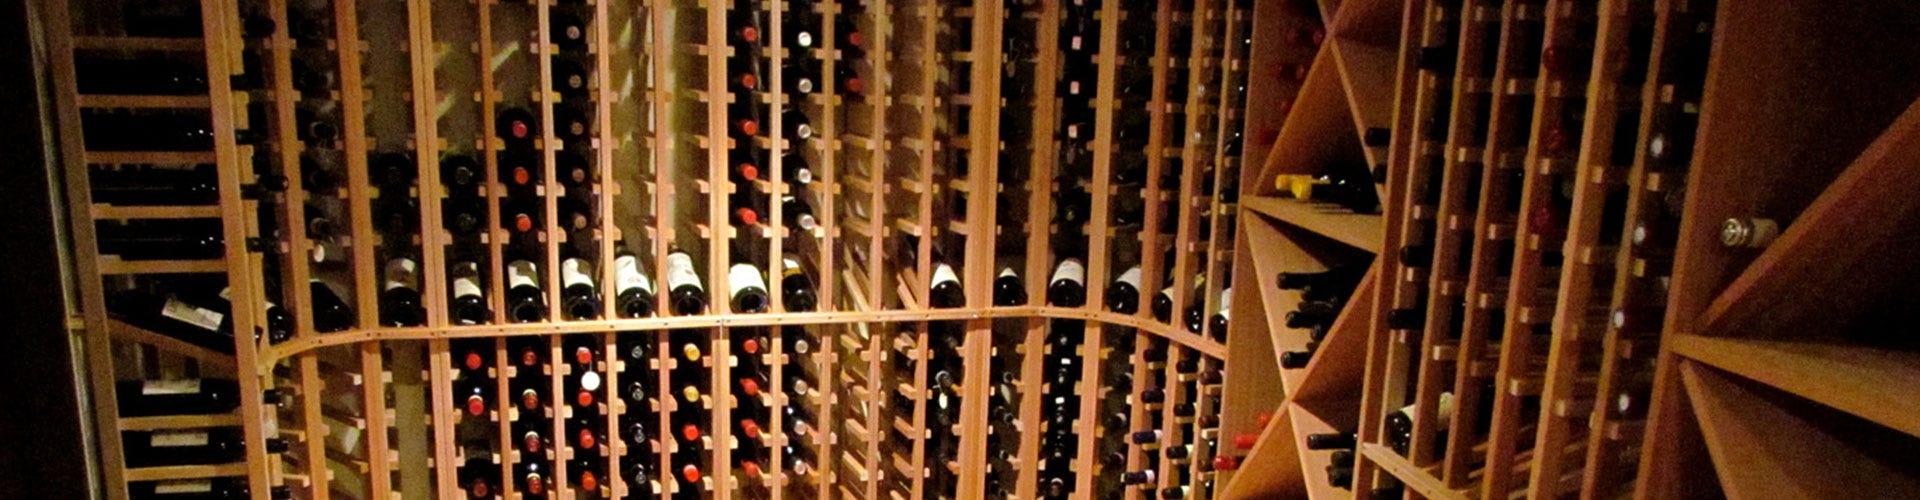 Prestige Wine Rack Kits